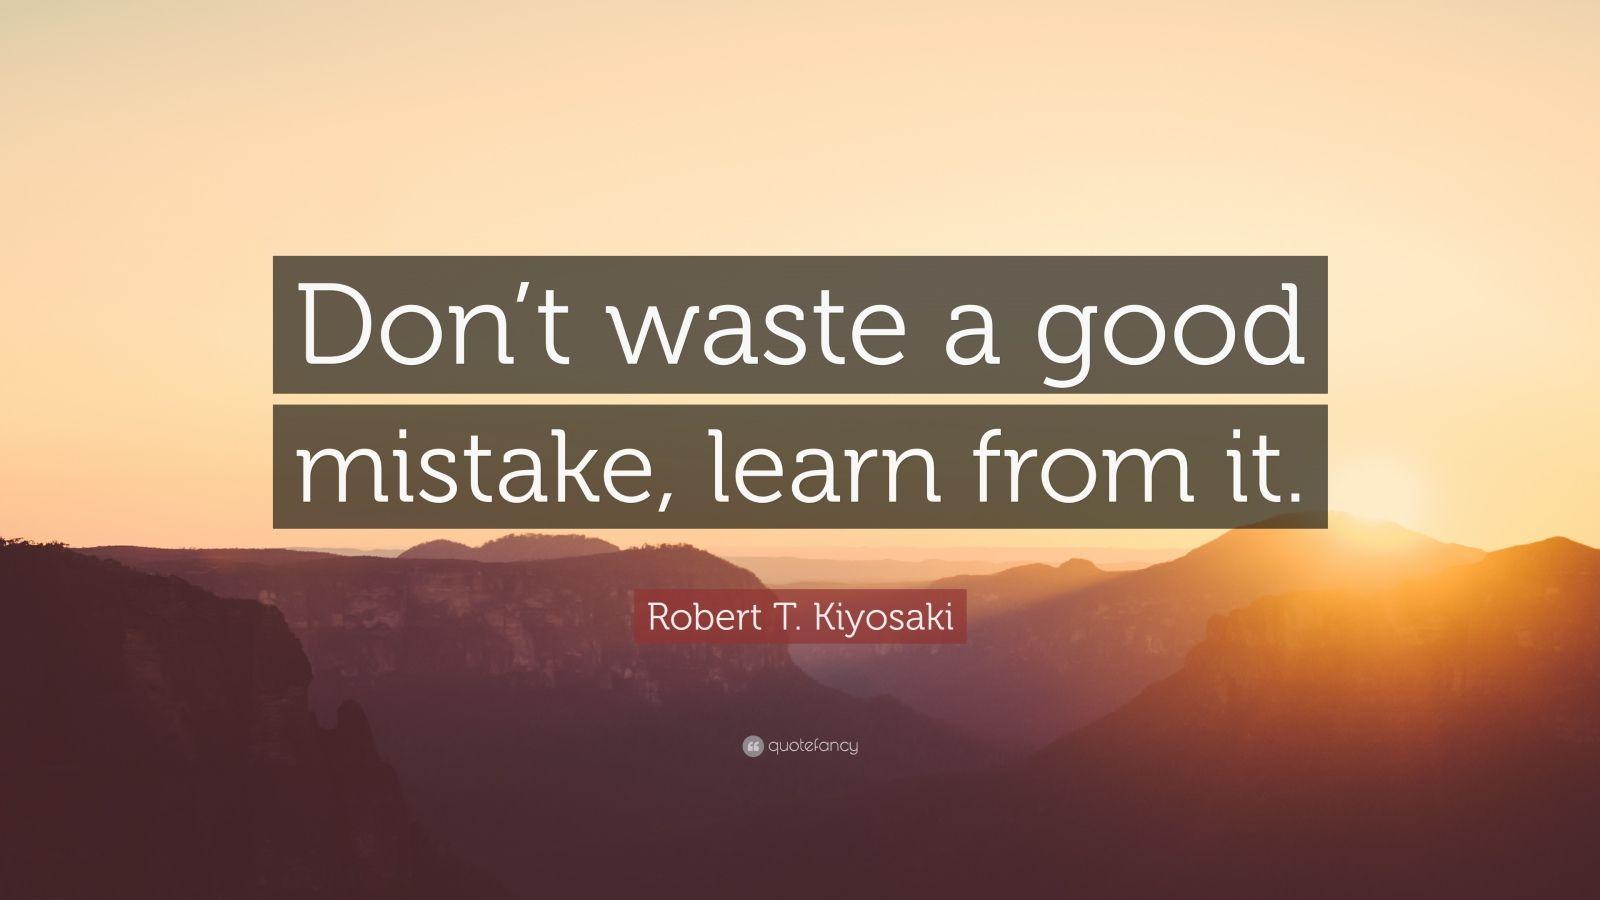 Steve Jobs Motivational Quotes Wallpaper Robert T Kiyosaki Quote Don T Waste A Good Mistake